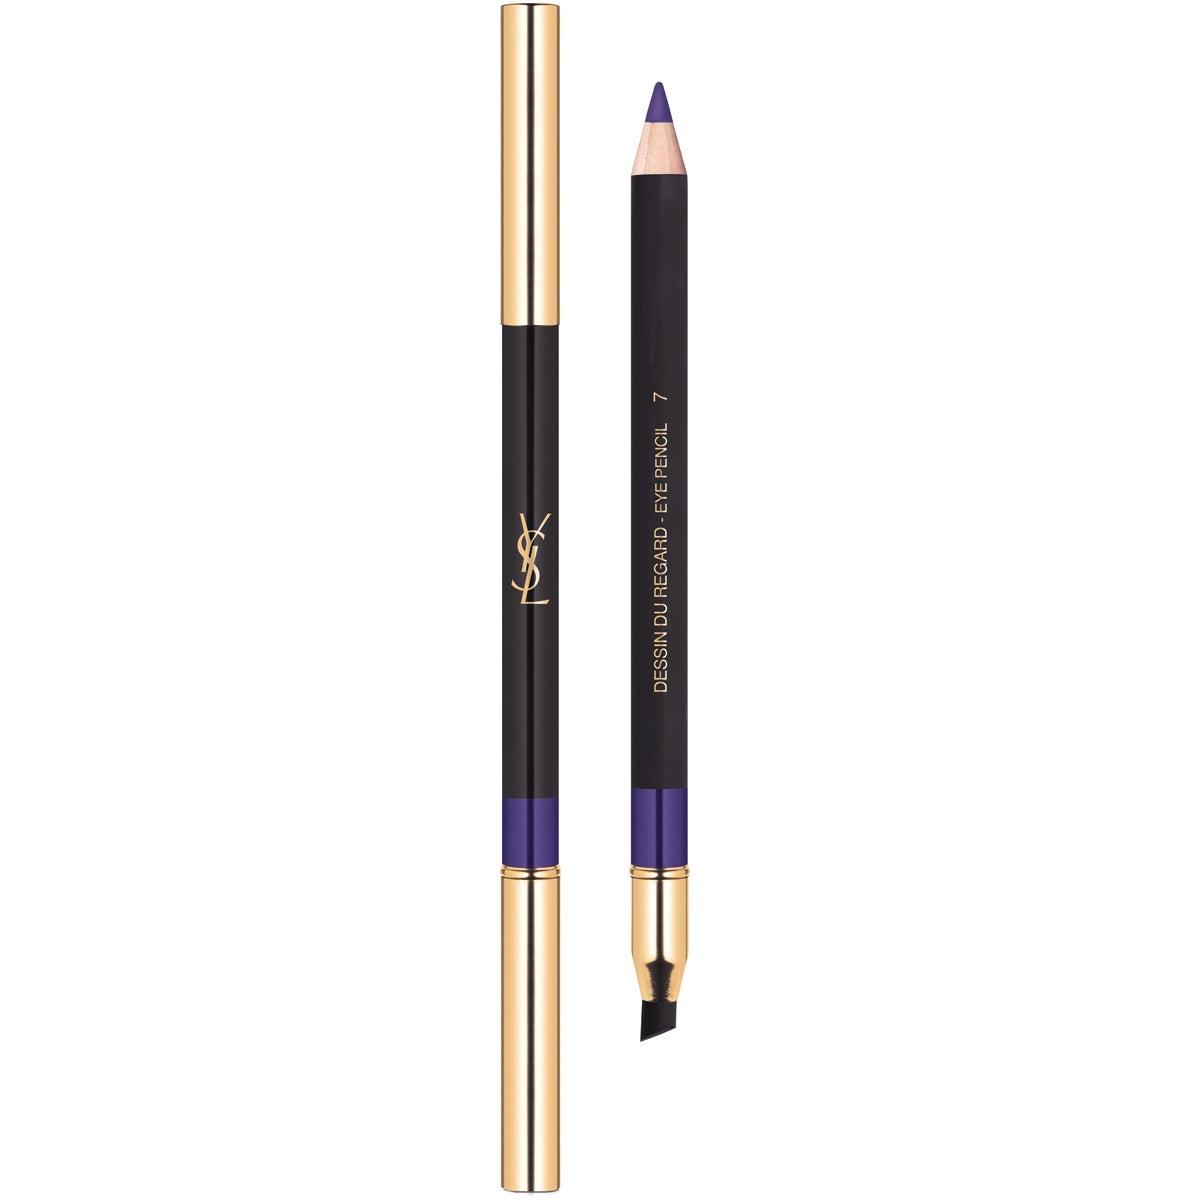 Dessin du Regard Crayon Yeux Yves Saint Laurent Eyeliner